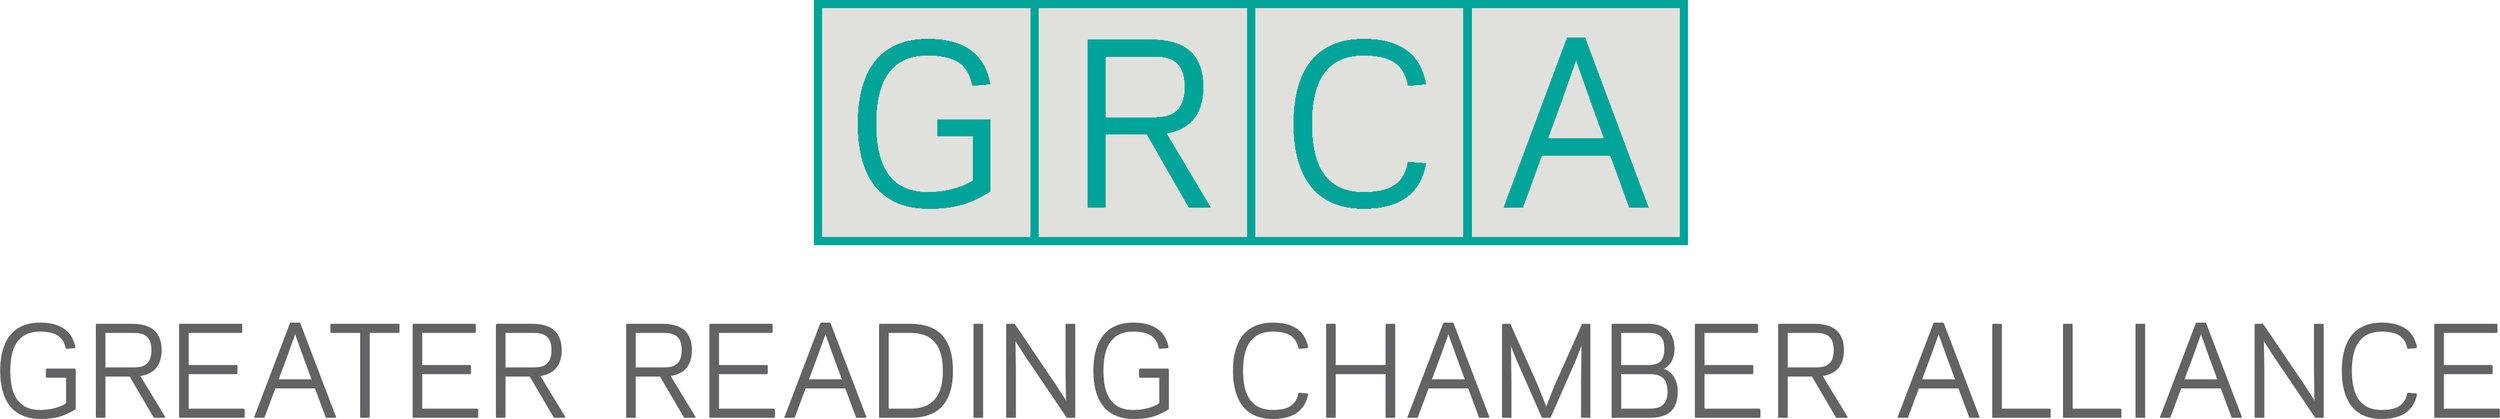 GRCA-logo-retorocle.jpg